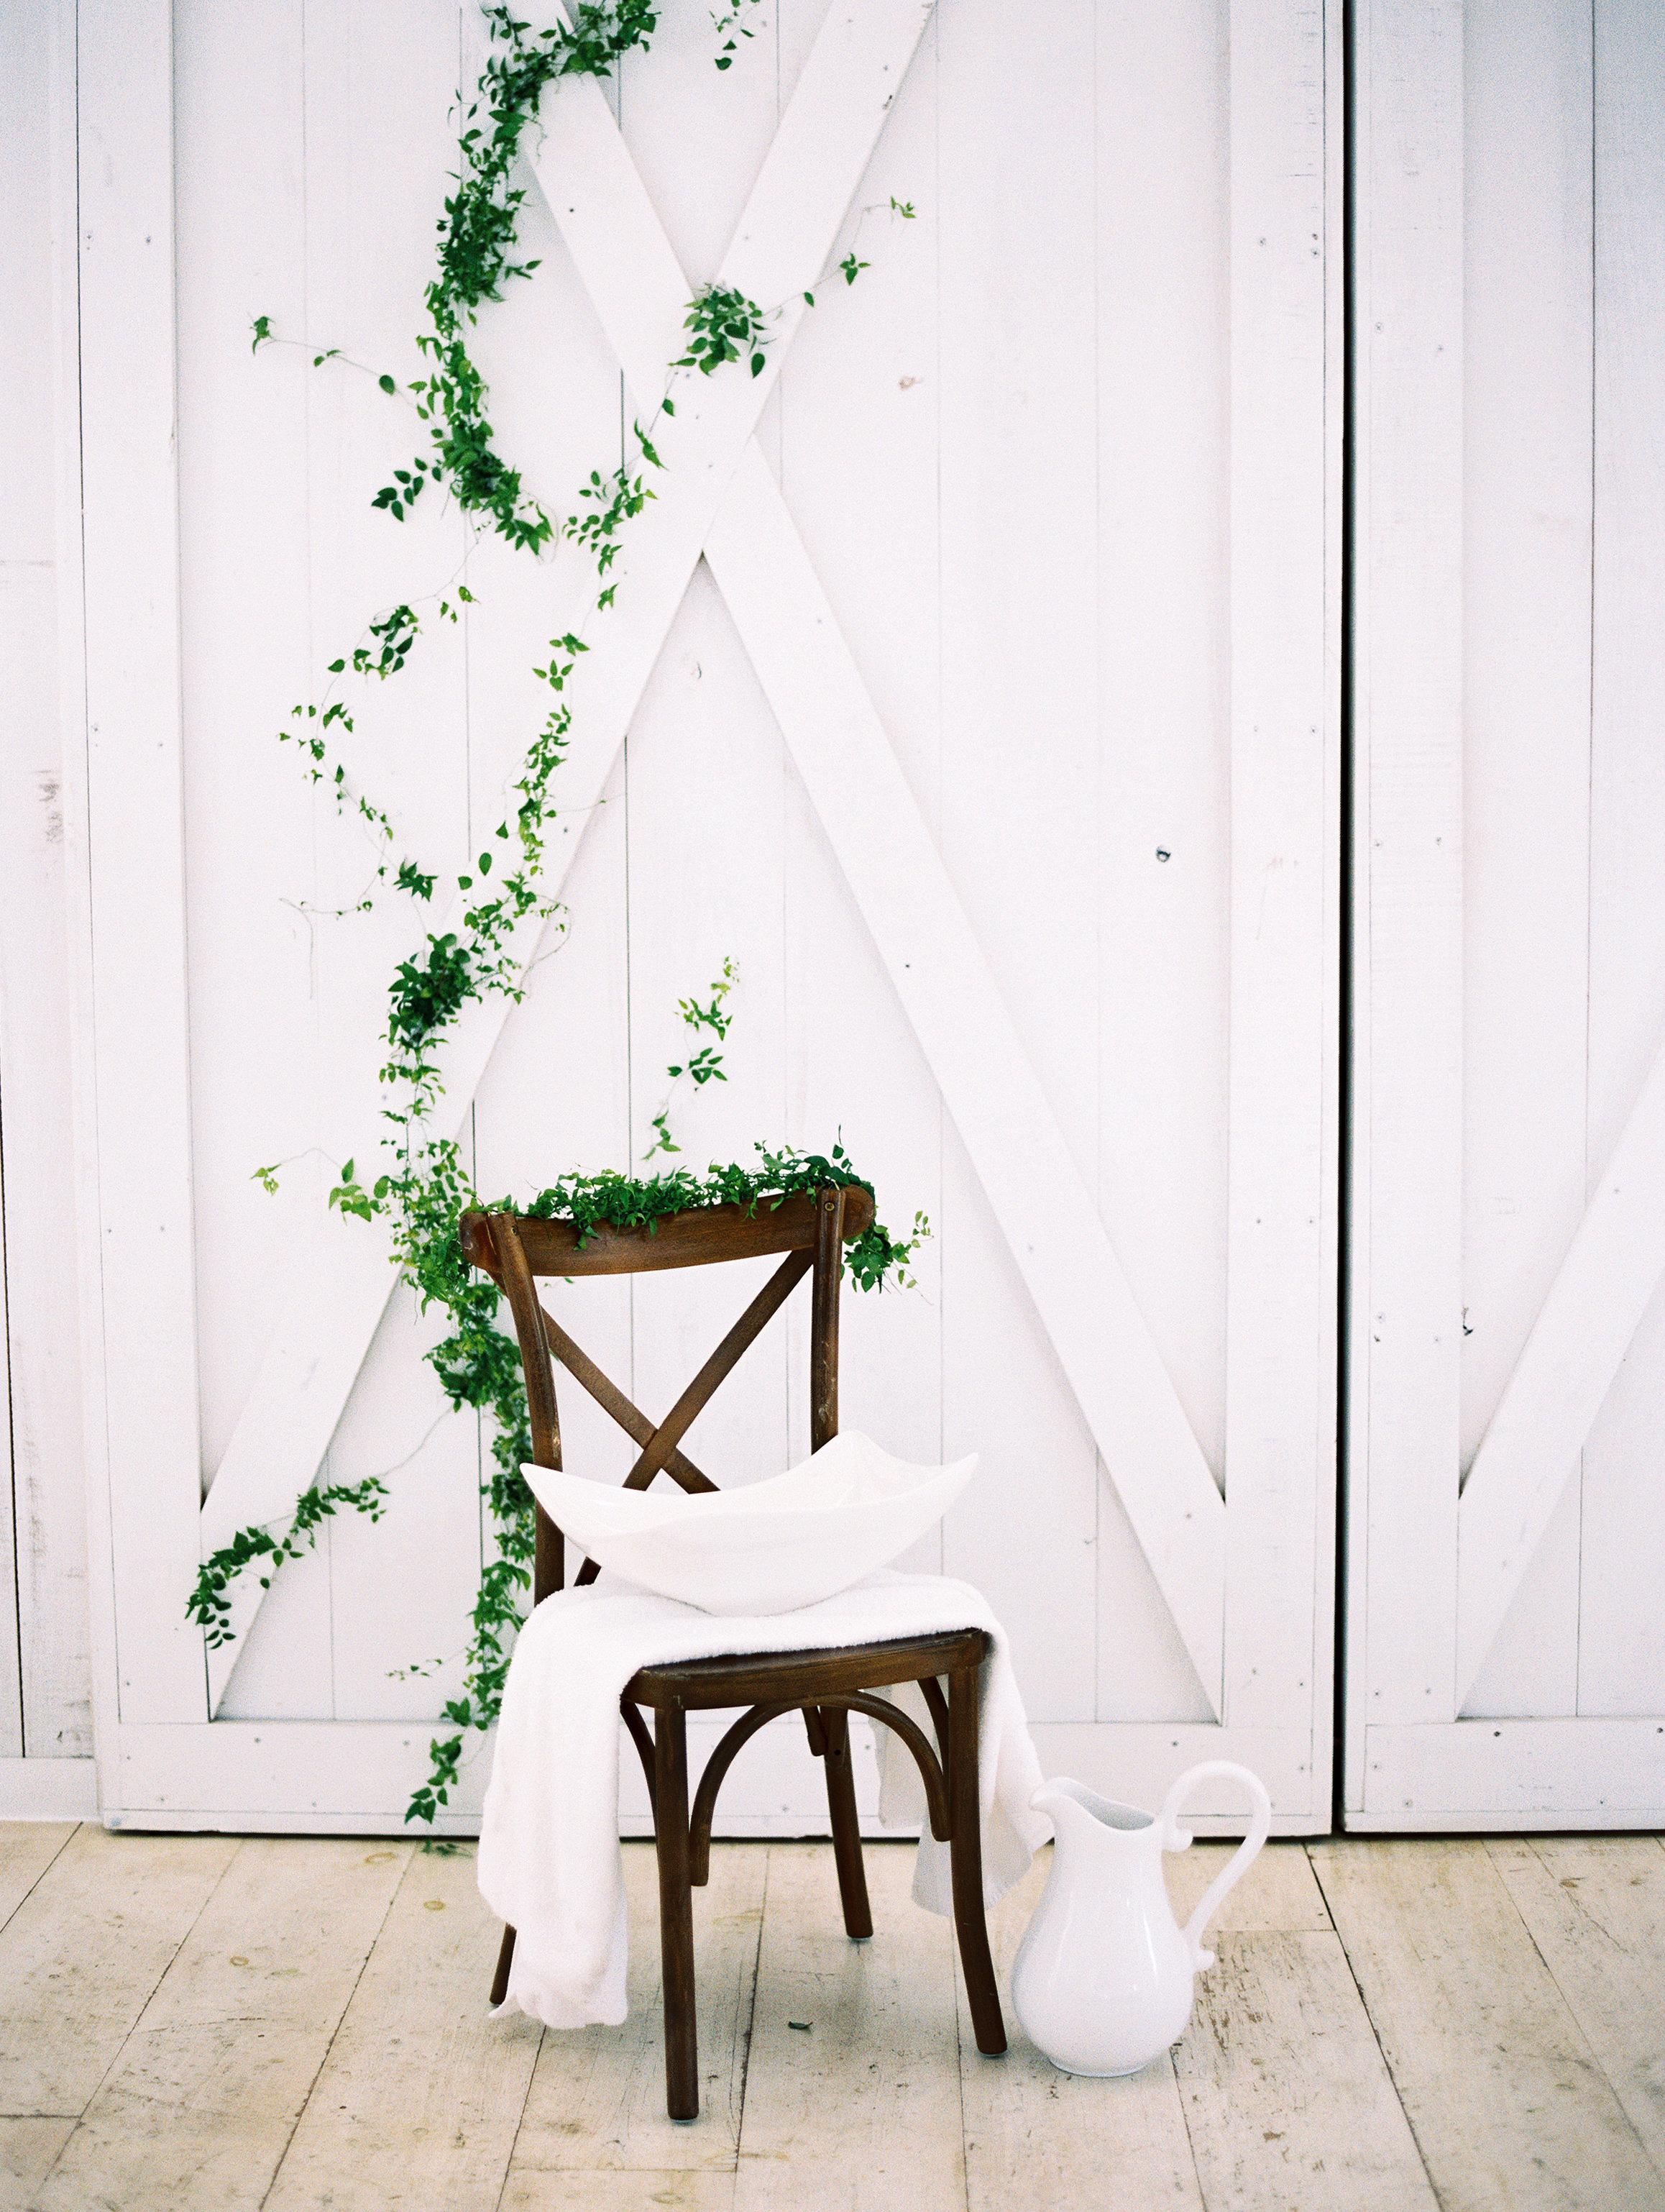 shakira travis wedding feet washing ceremony chair